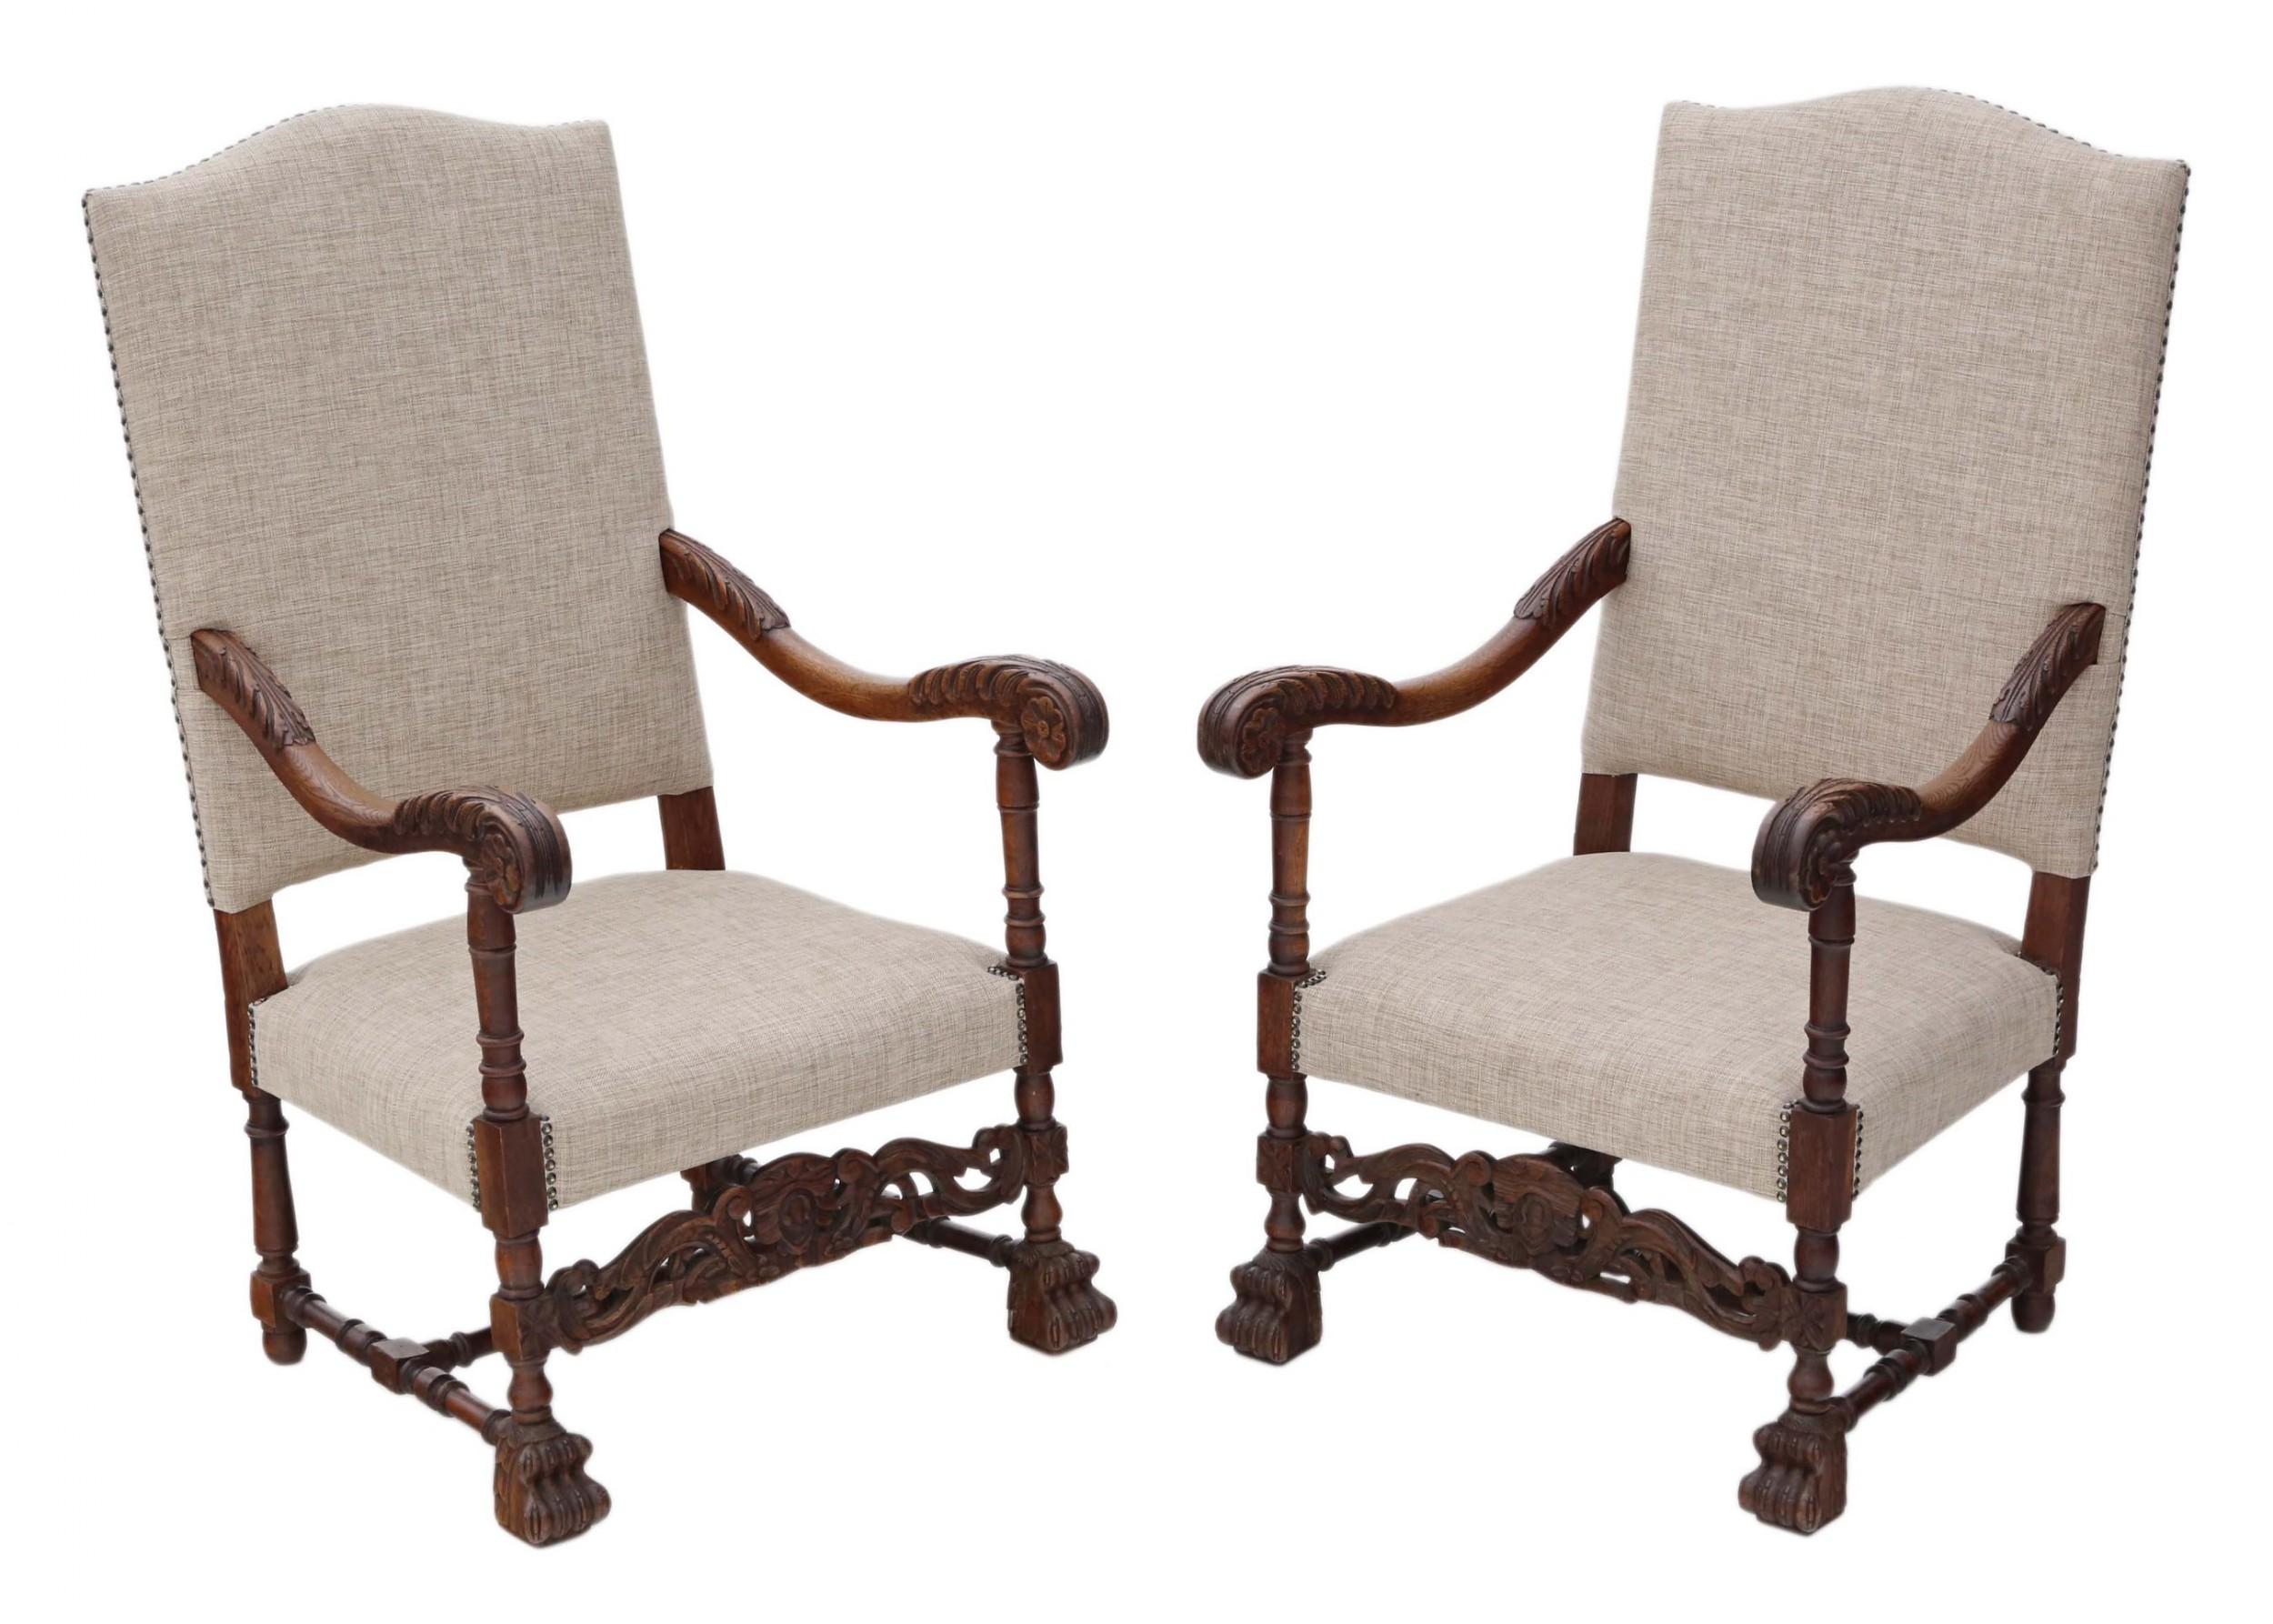 Pair Of Oak Armchairs   607787   Sellingantiques.co.uk